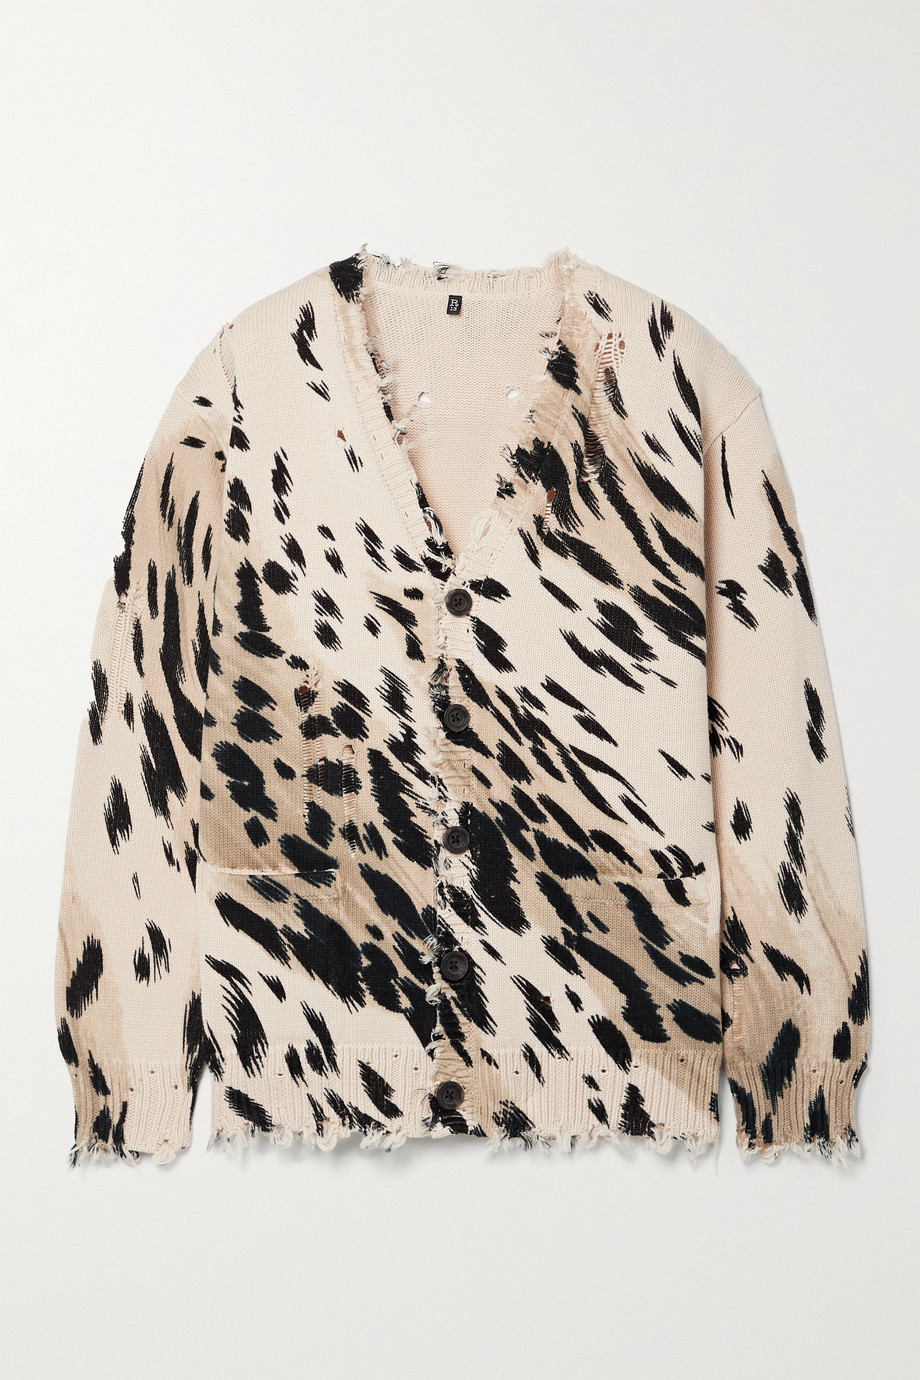 R13 Distressed cheetah-print cotton cardigan